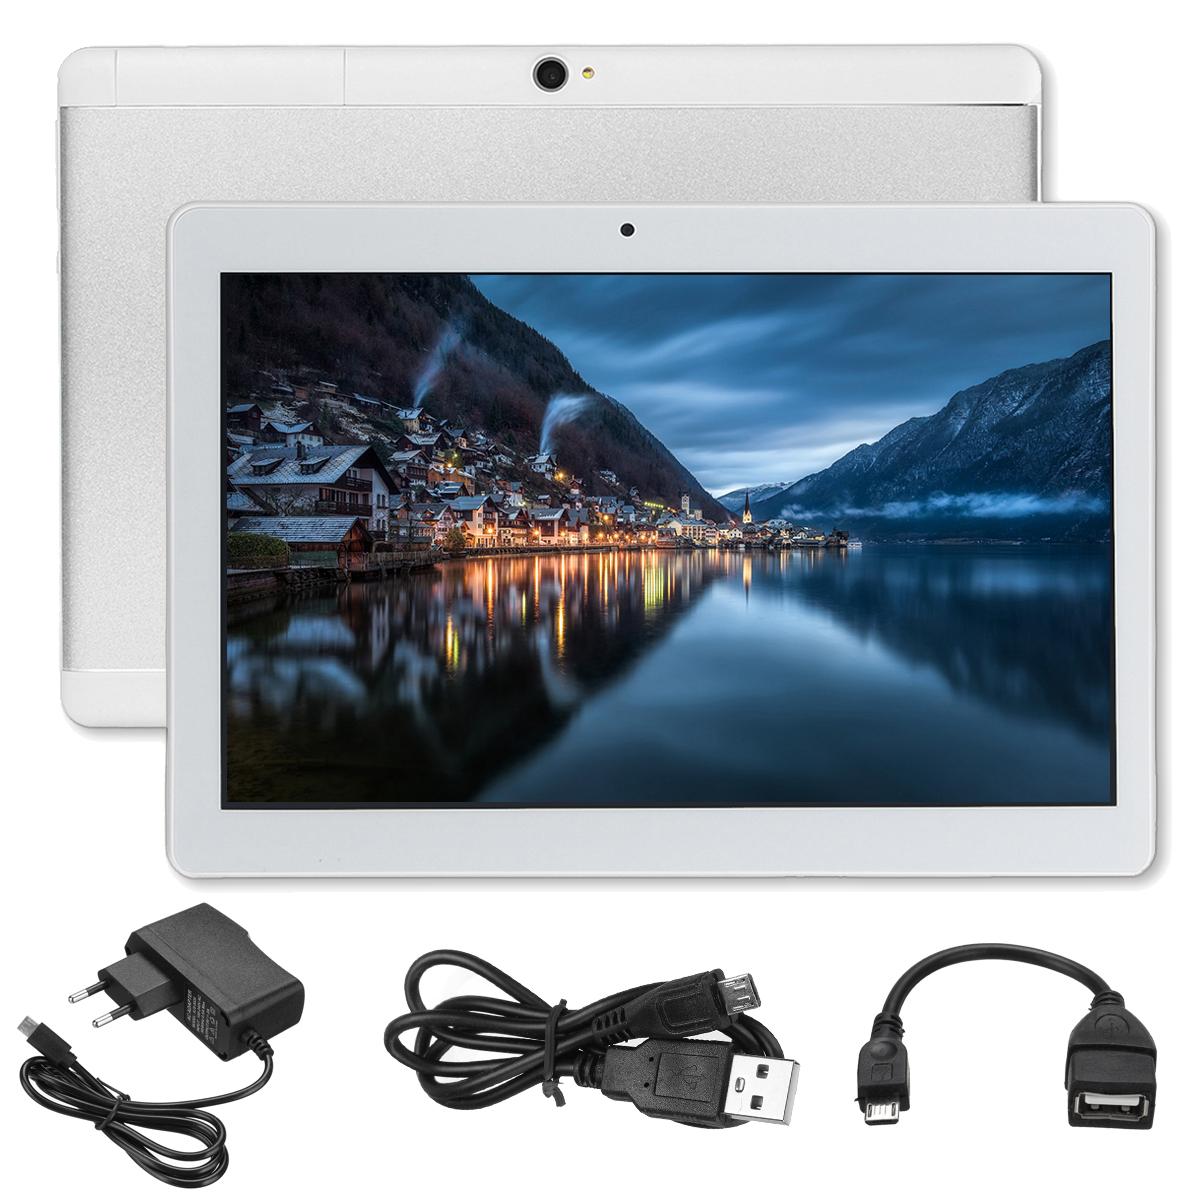 64GB-4GB-10-1-039-039-Android-7-0-Tablet-PC-Core-8-HD-WIFI-Bluetooth-2-SIM-Bundle-Cove